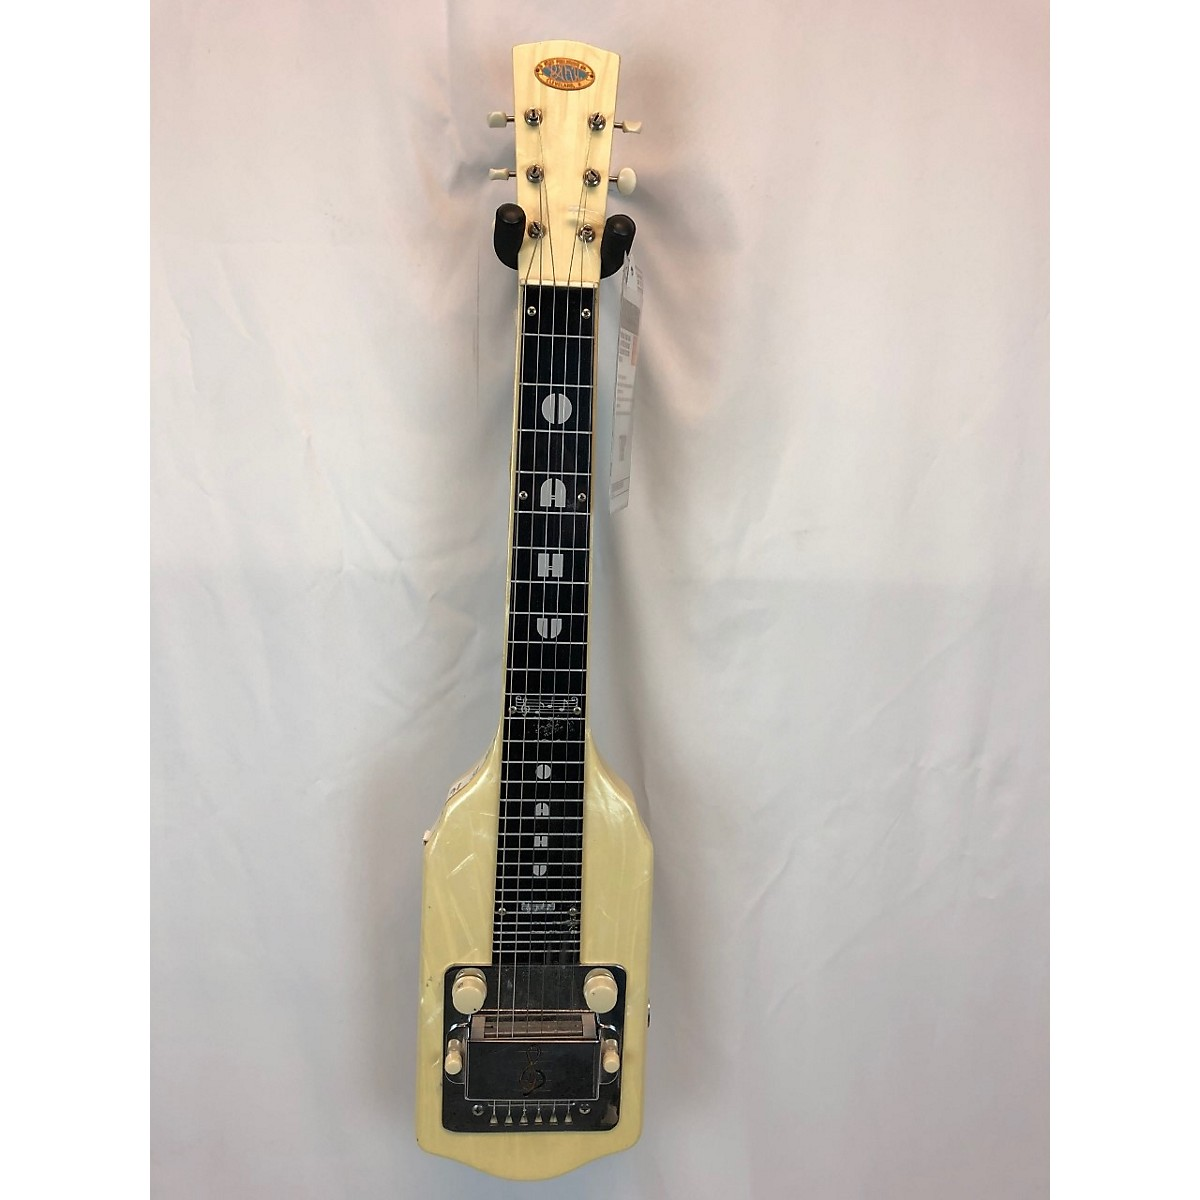 Oahu 1960s Lap Steel Solid Body Electric Guitar